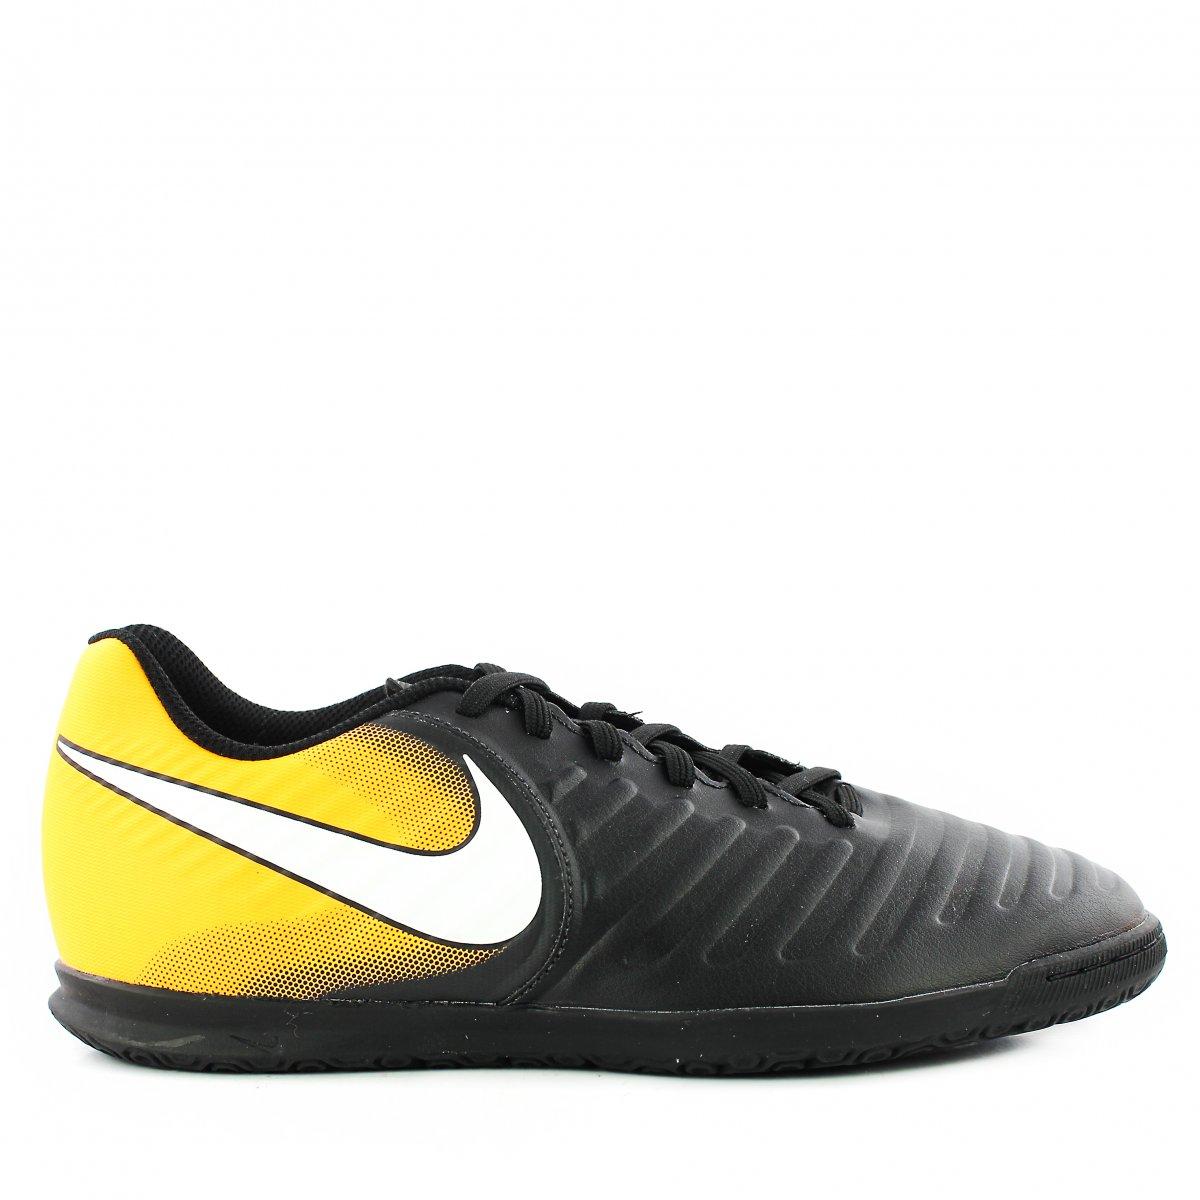 9ec9a4d63 Chuteira Nike Tiempox Rio iv ic | Preto/laranja | Coutope